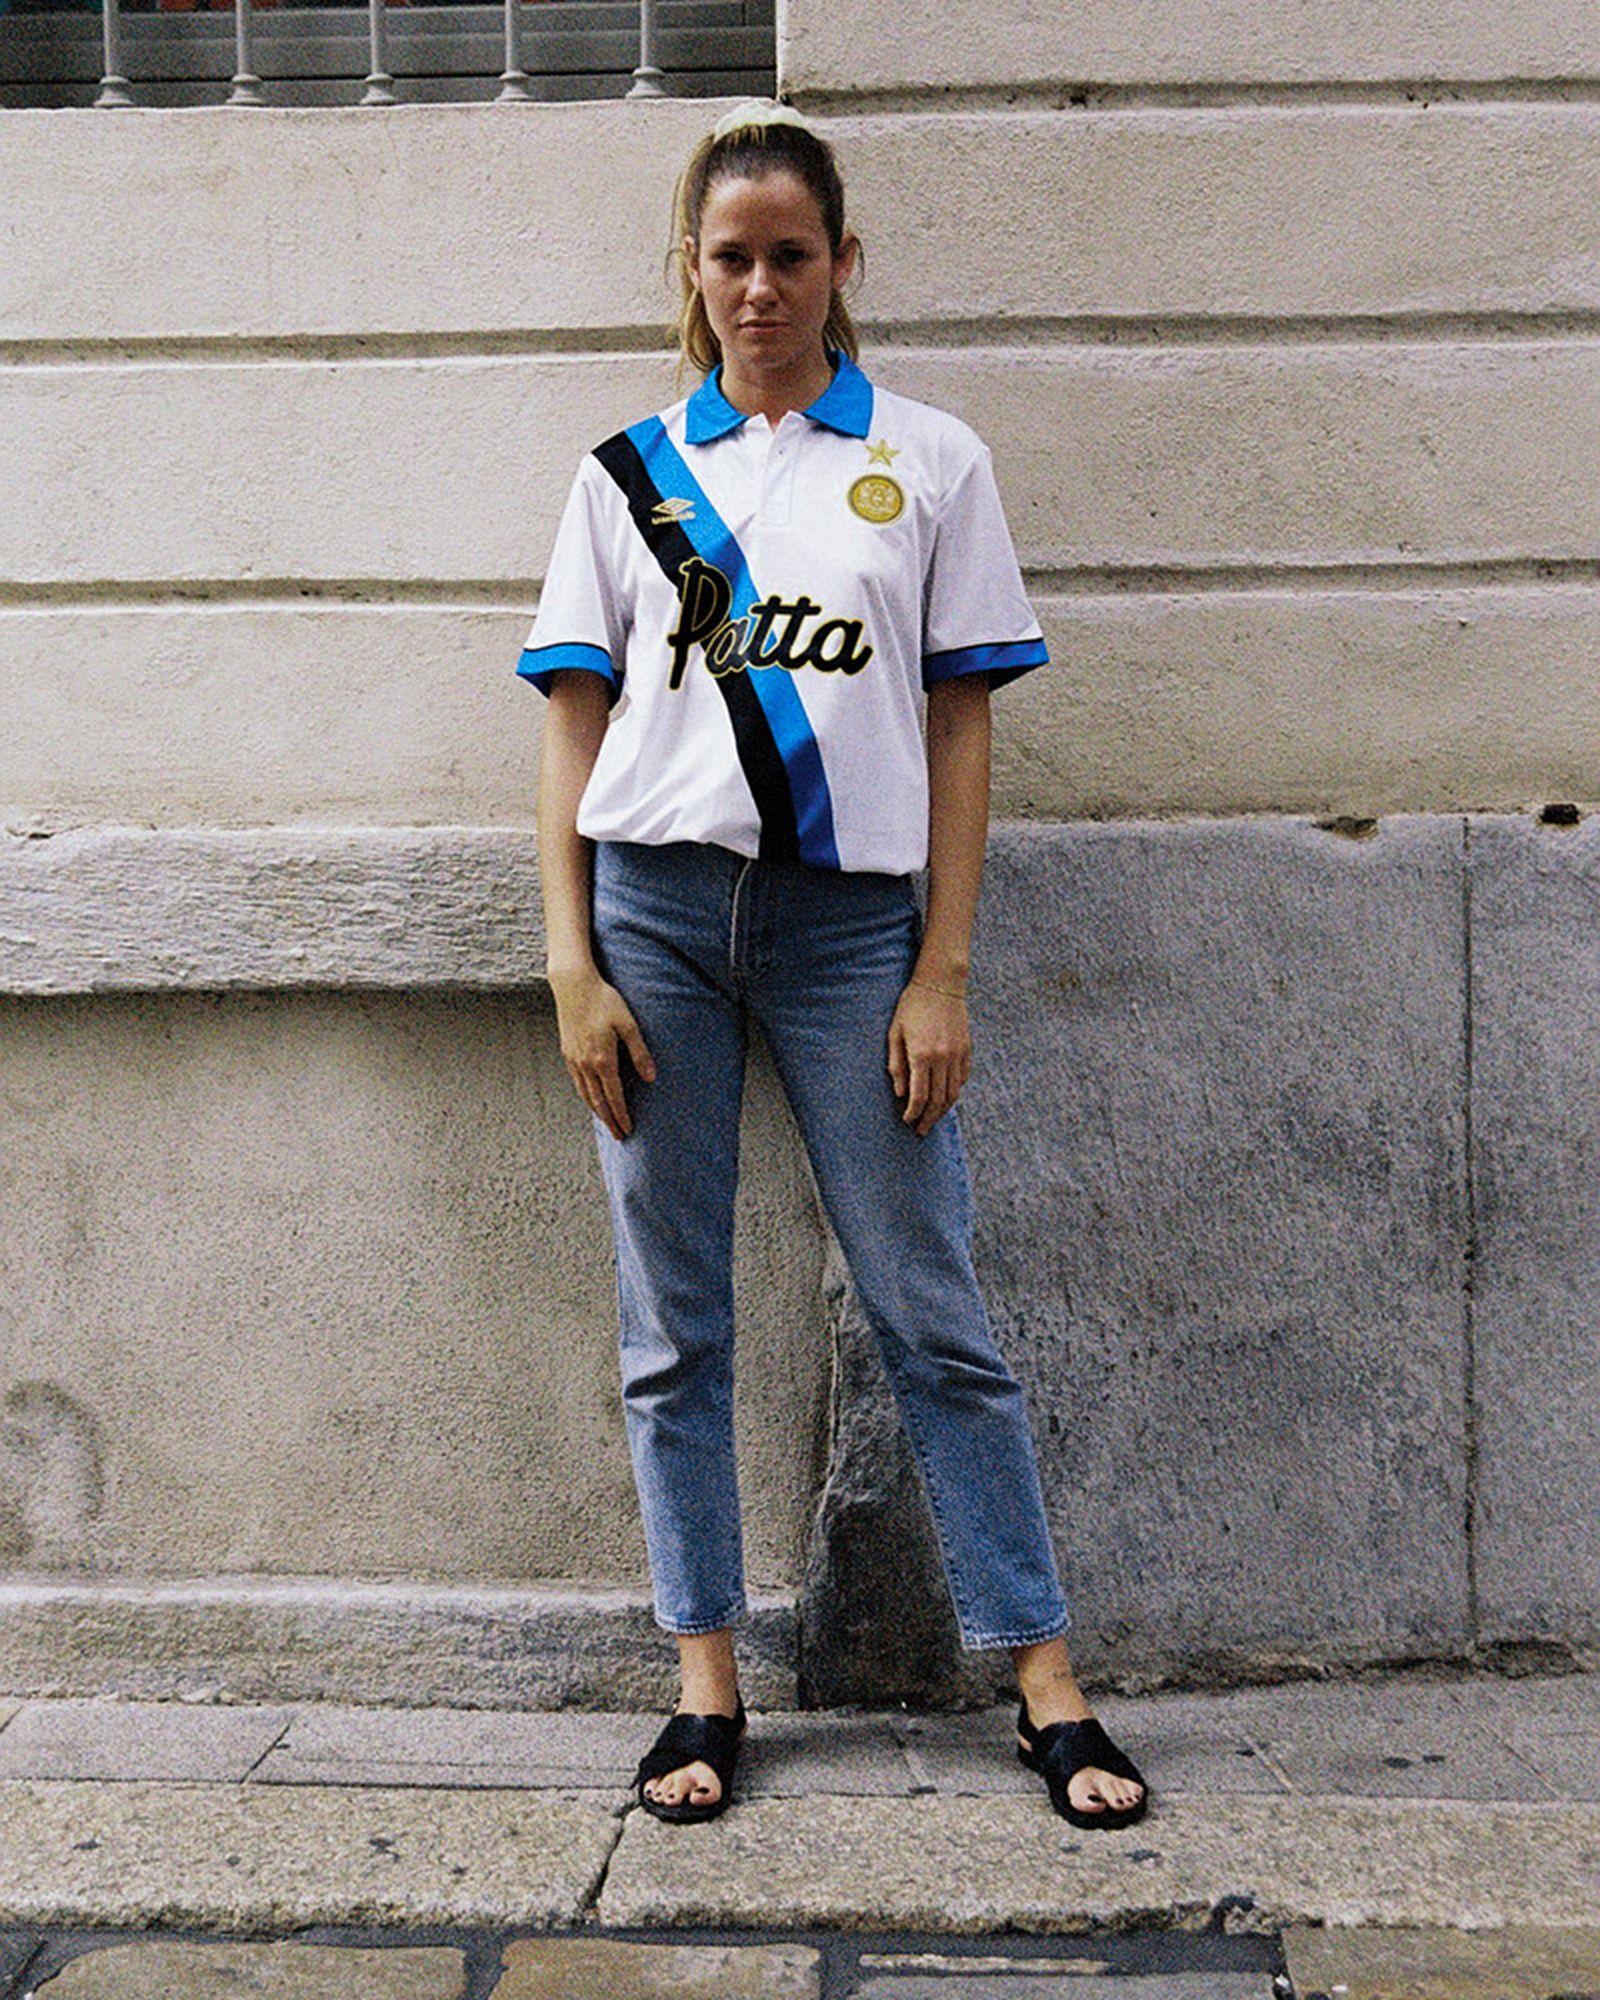 patta-umbro-inter-away-jersey-release-date-price-07